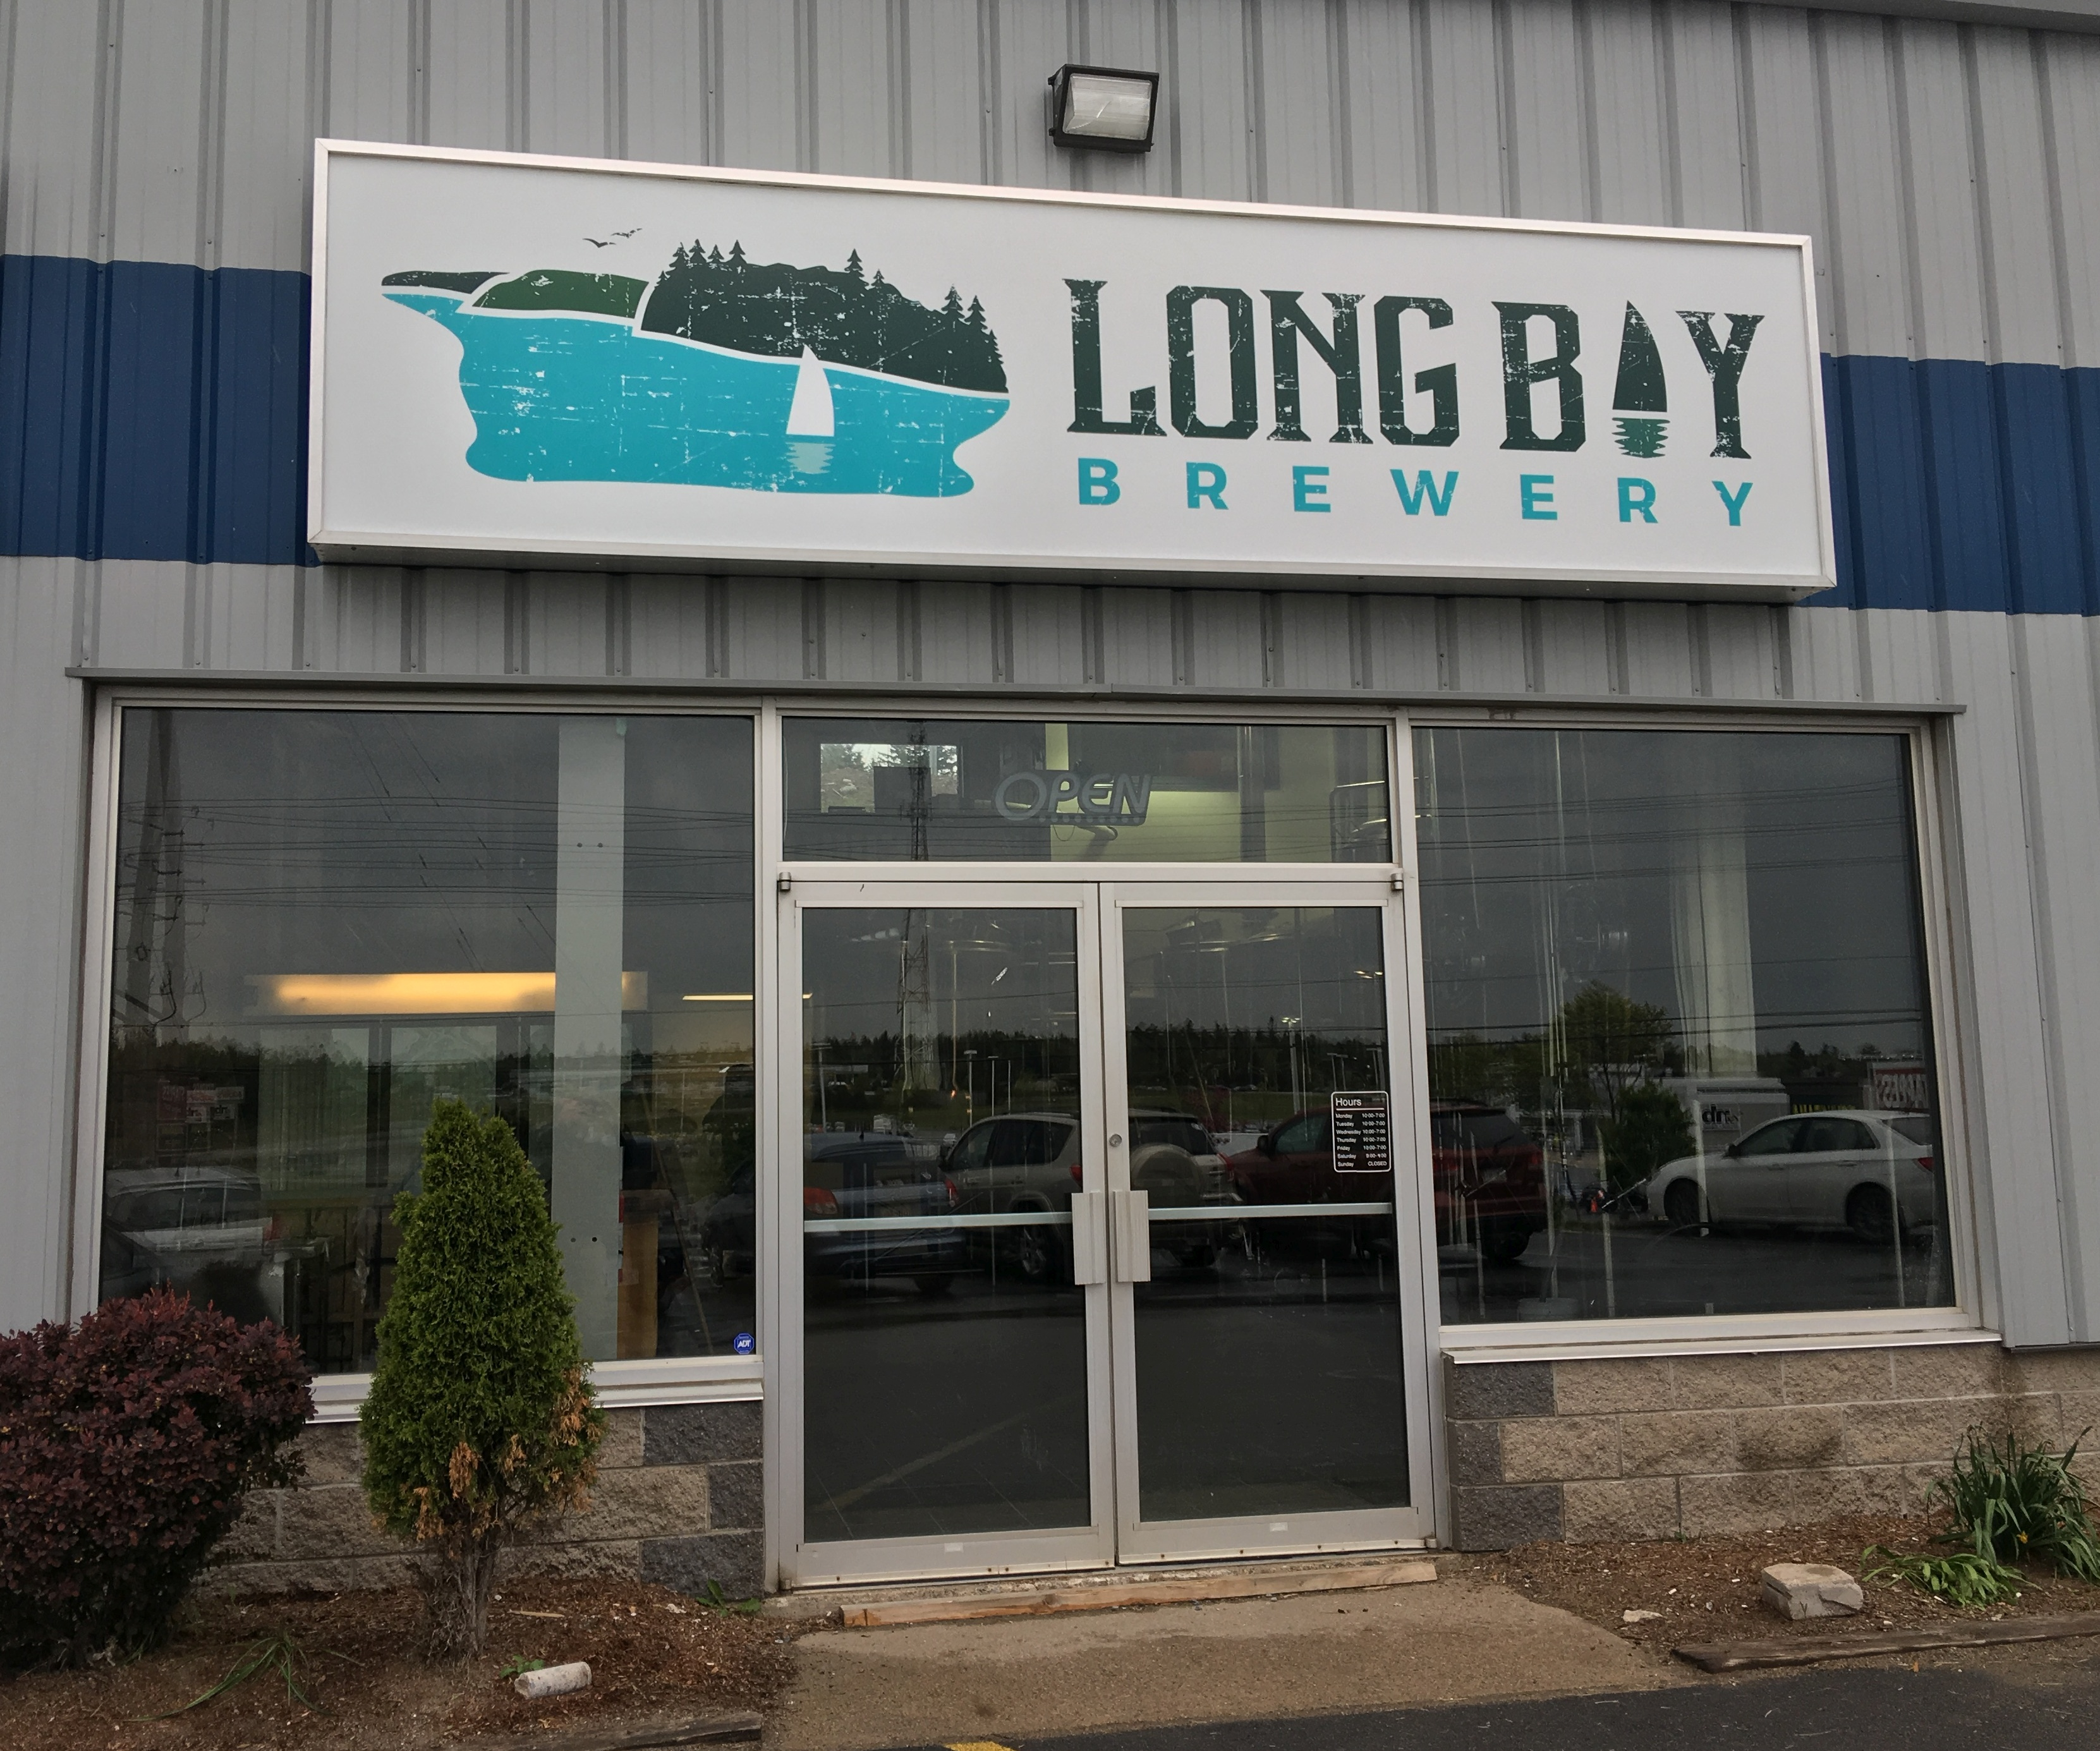 long bay brewery u2013 open now in rothesay nb atlantic canada beer